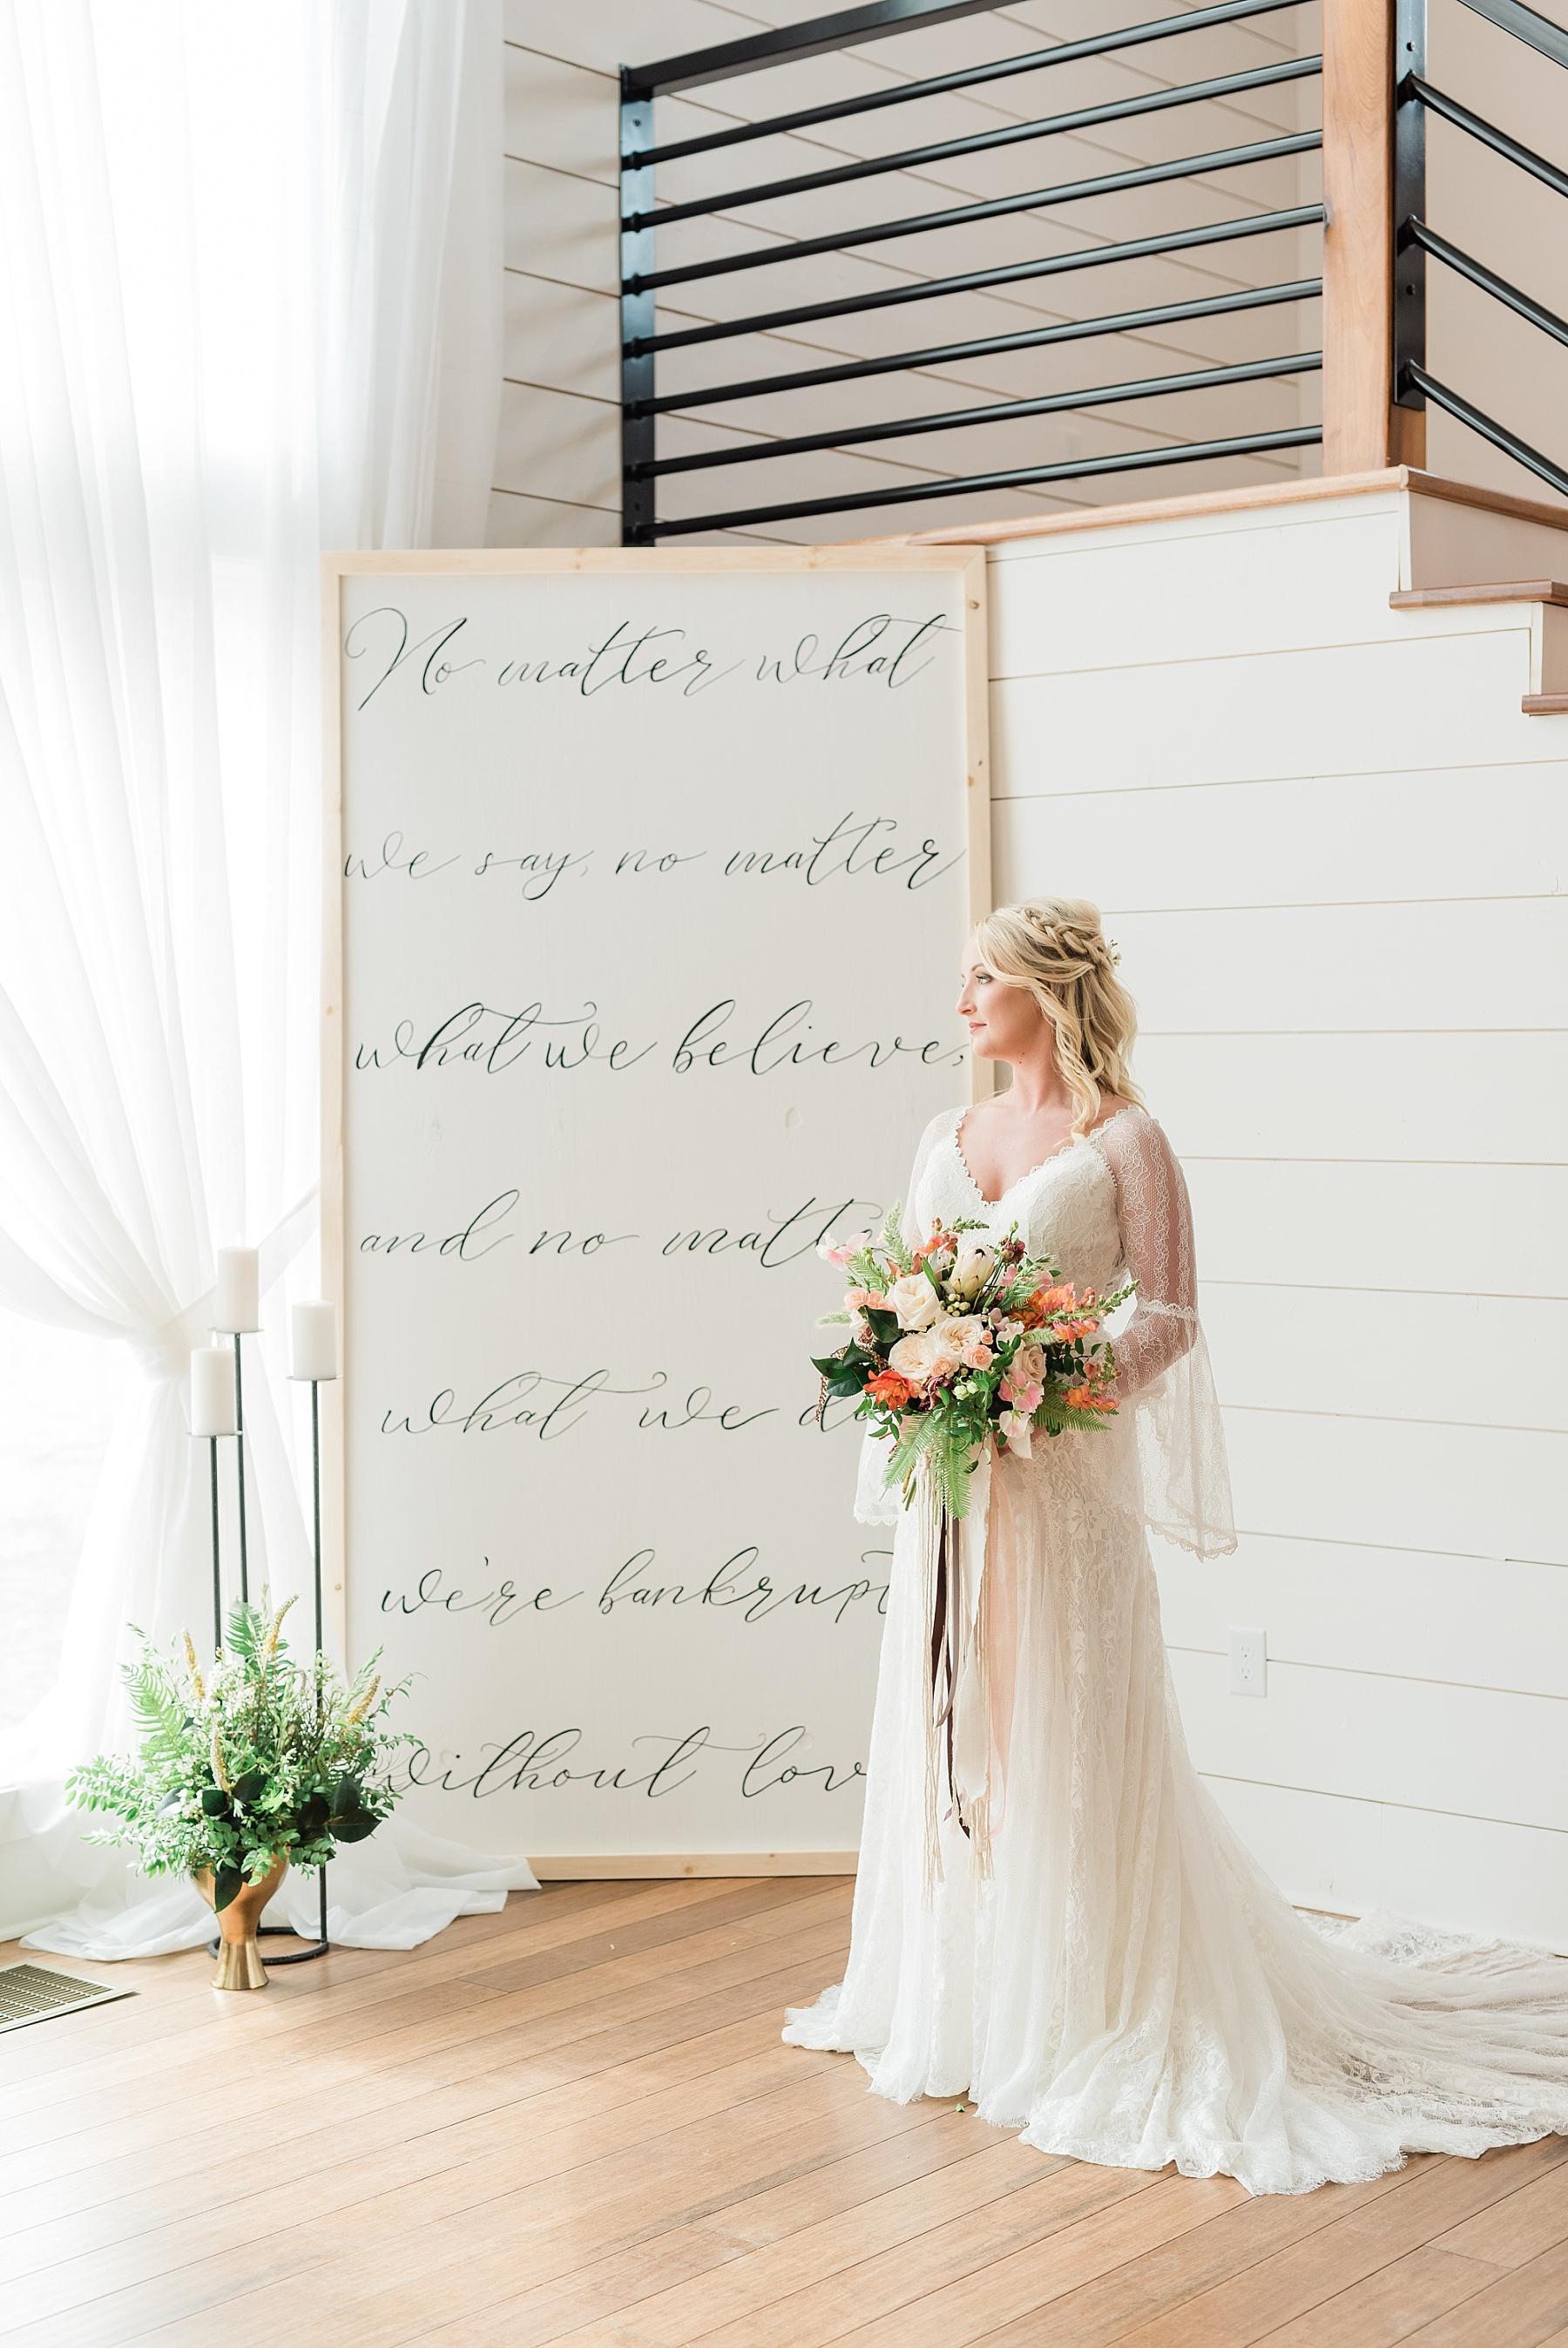 Eclectic Scandinavian Winter Wedding in All White Venue Emerson Fields by Kelsi Kliethermes Photography Best Missouri and Maui Wedding Photographer_0086.jpg